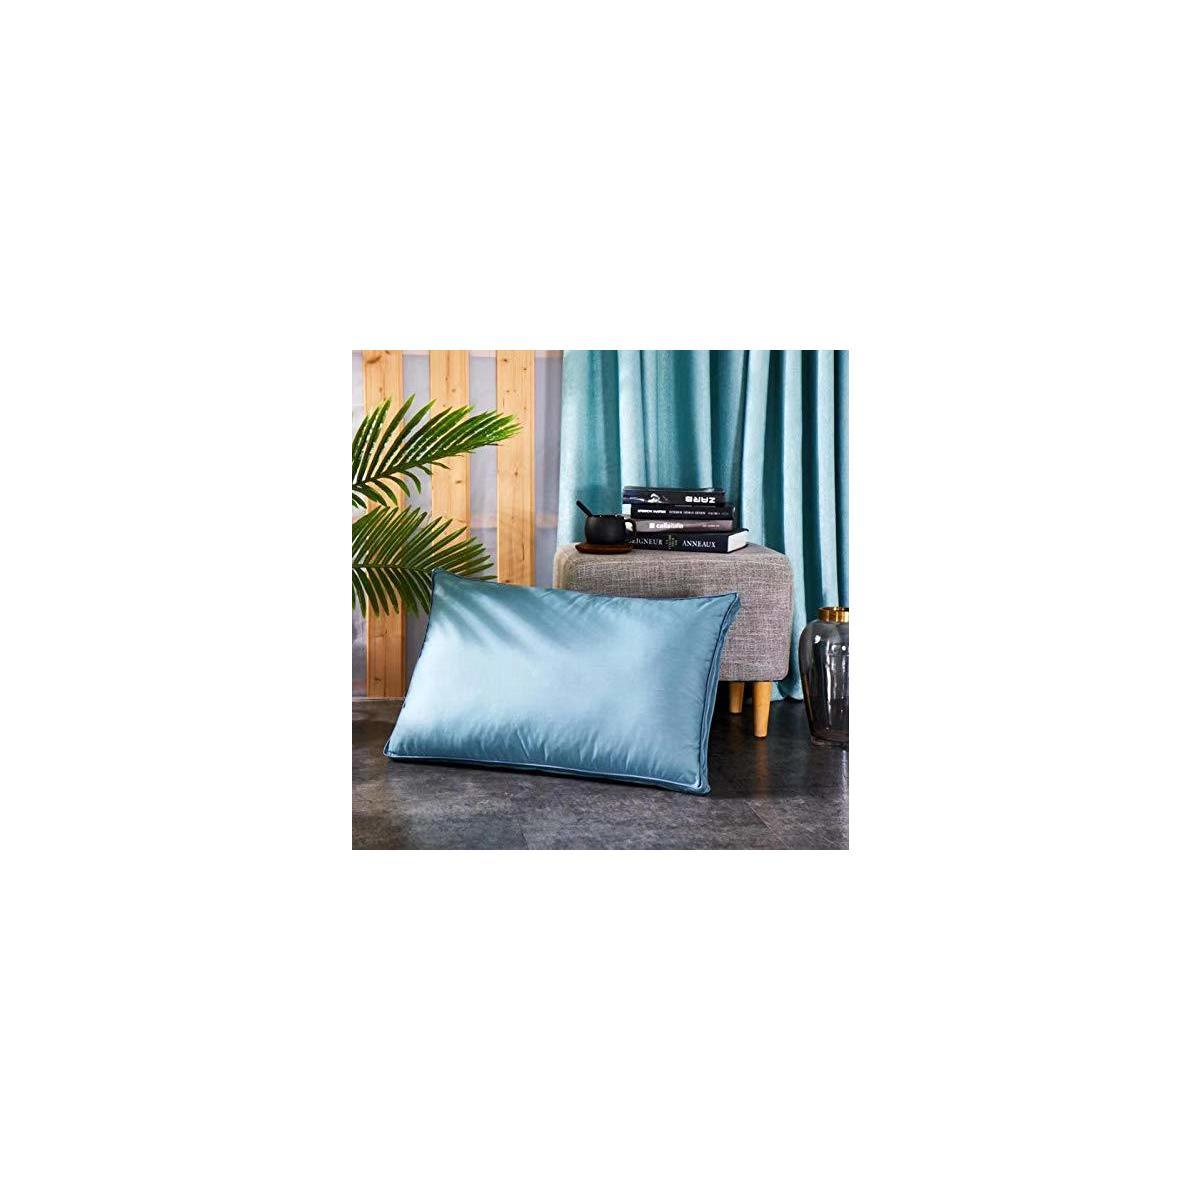 Topper Pillow, Adjustable Pillow Top Pillow, Double Layer Pillow, Add Any Pillow Inside